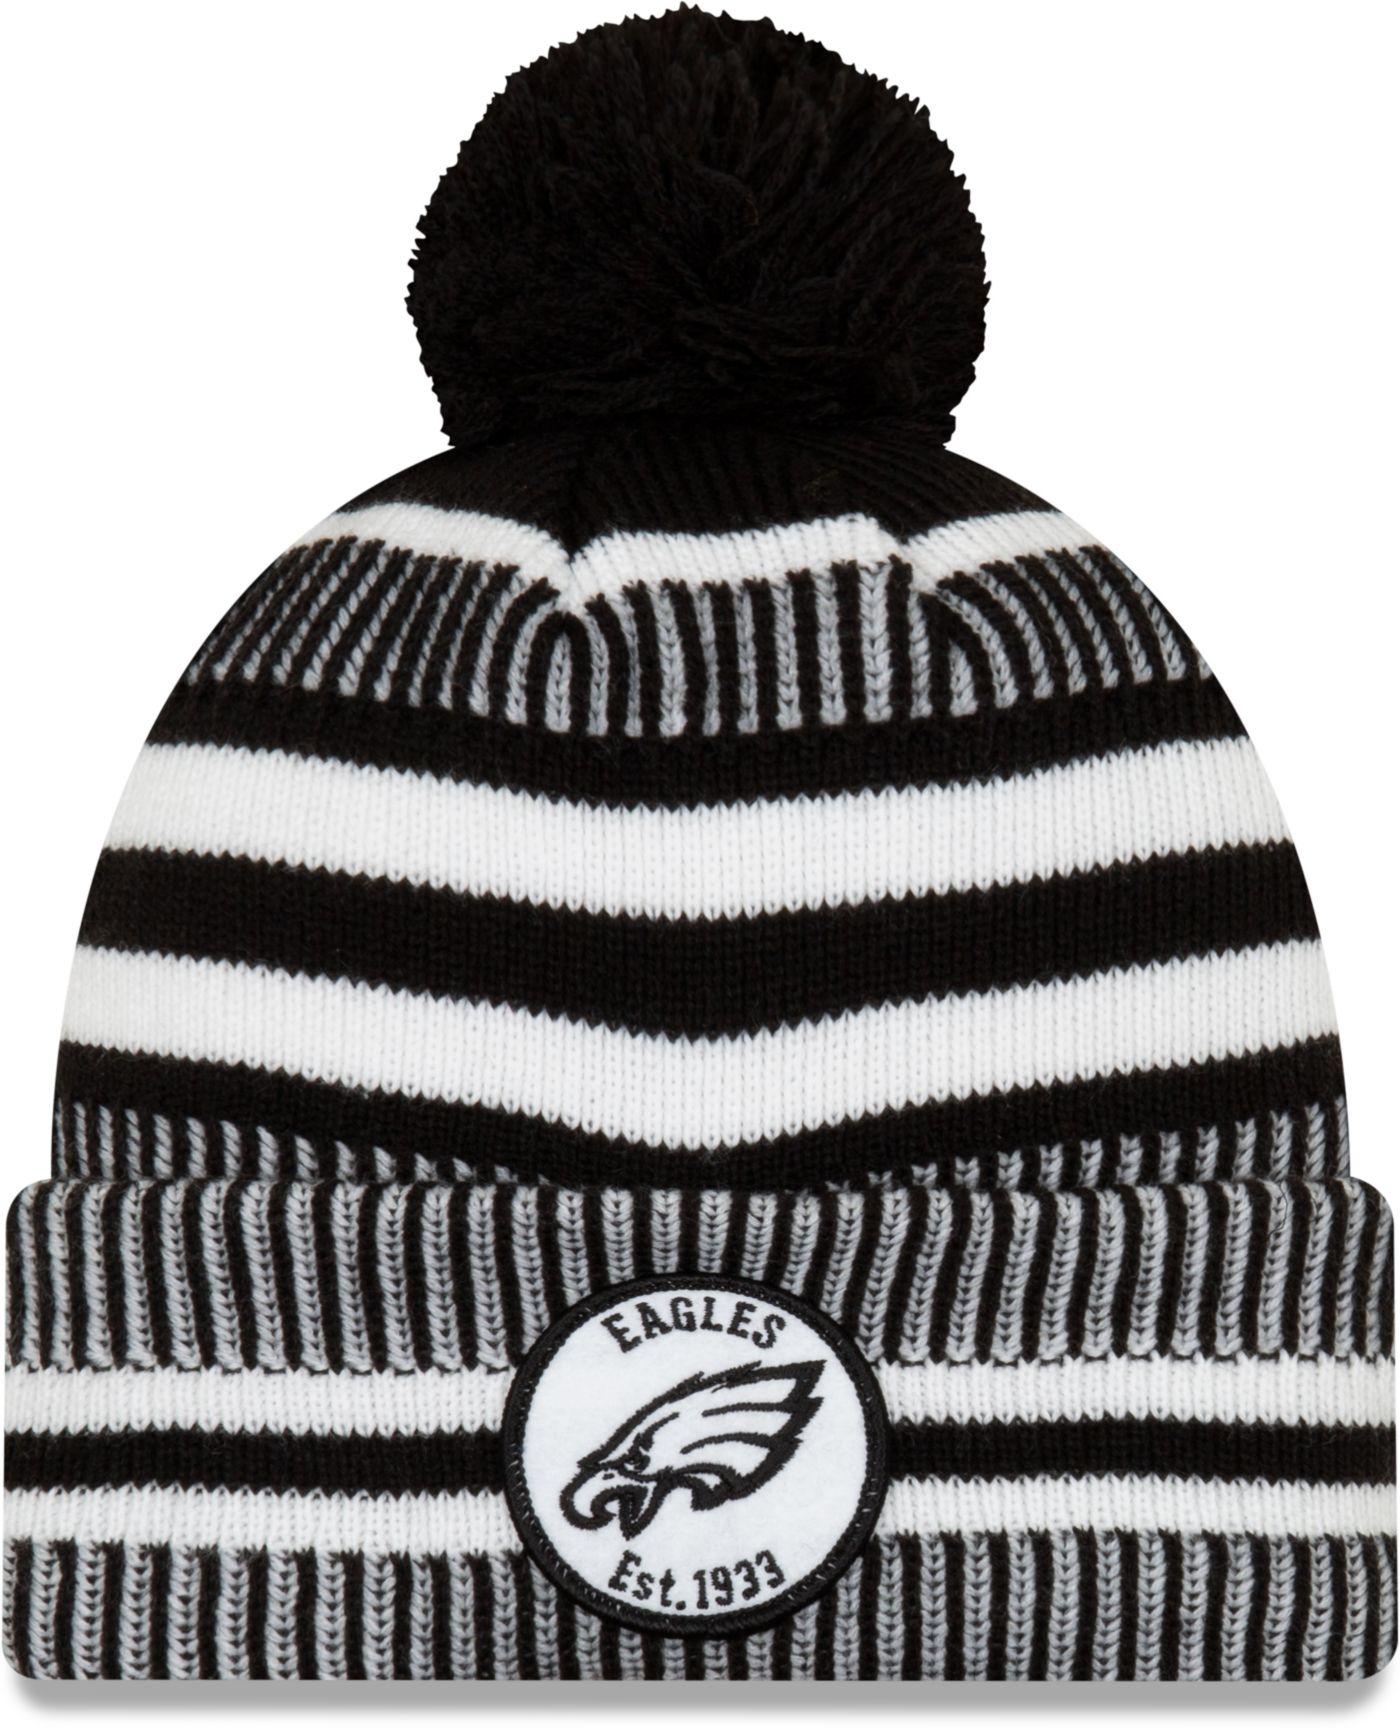 New Era Men's Philadelphia Eagles Sideline Home Sport Pom Knit